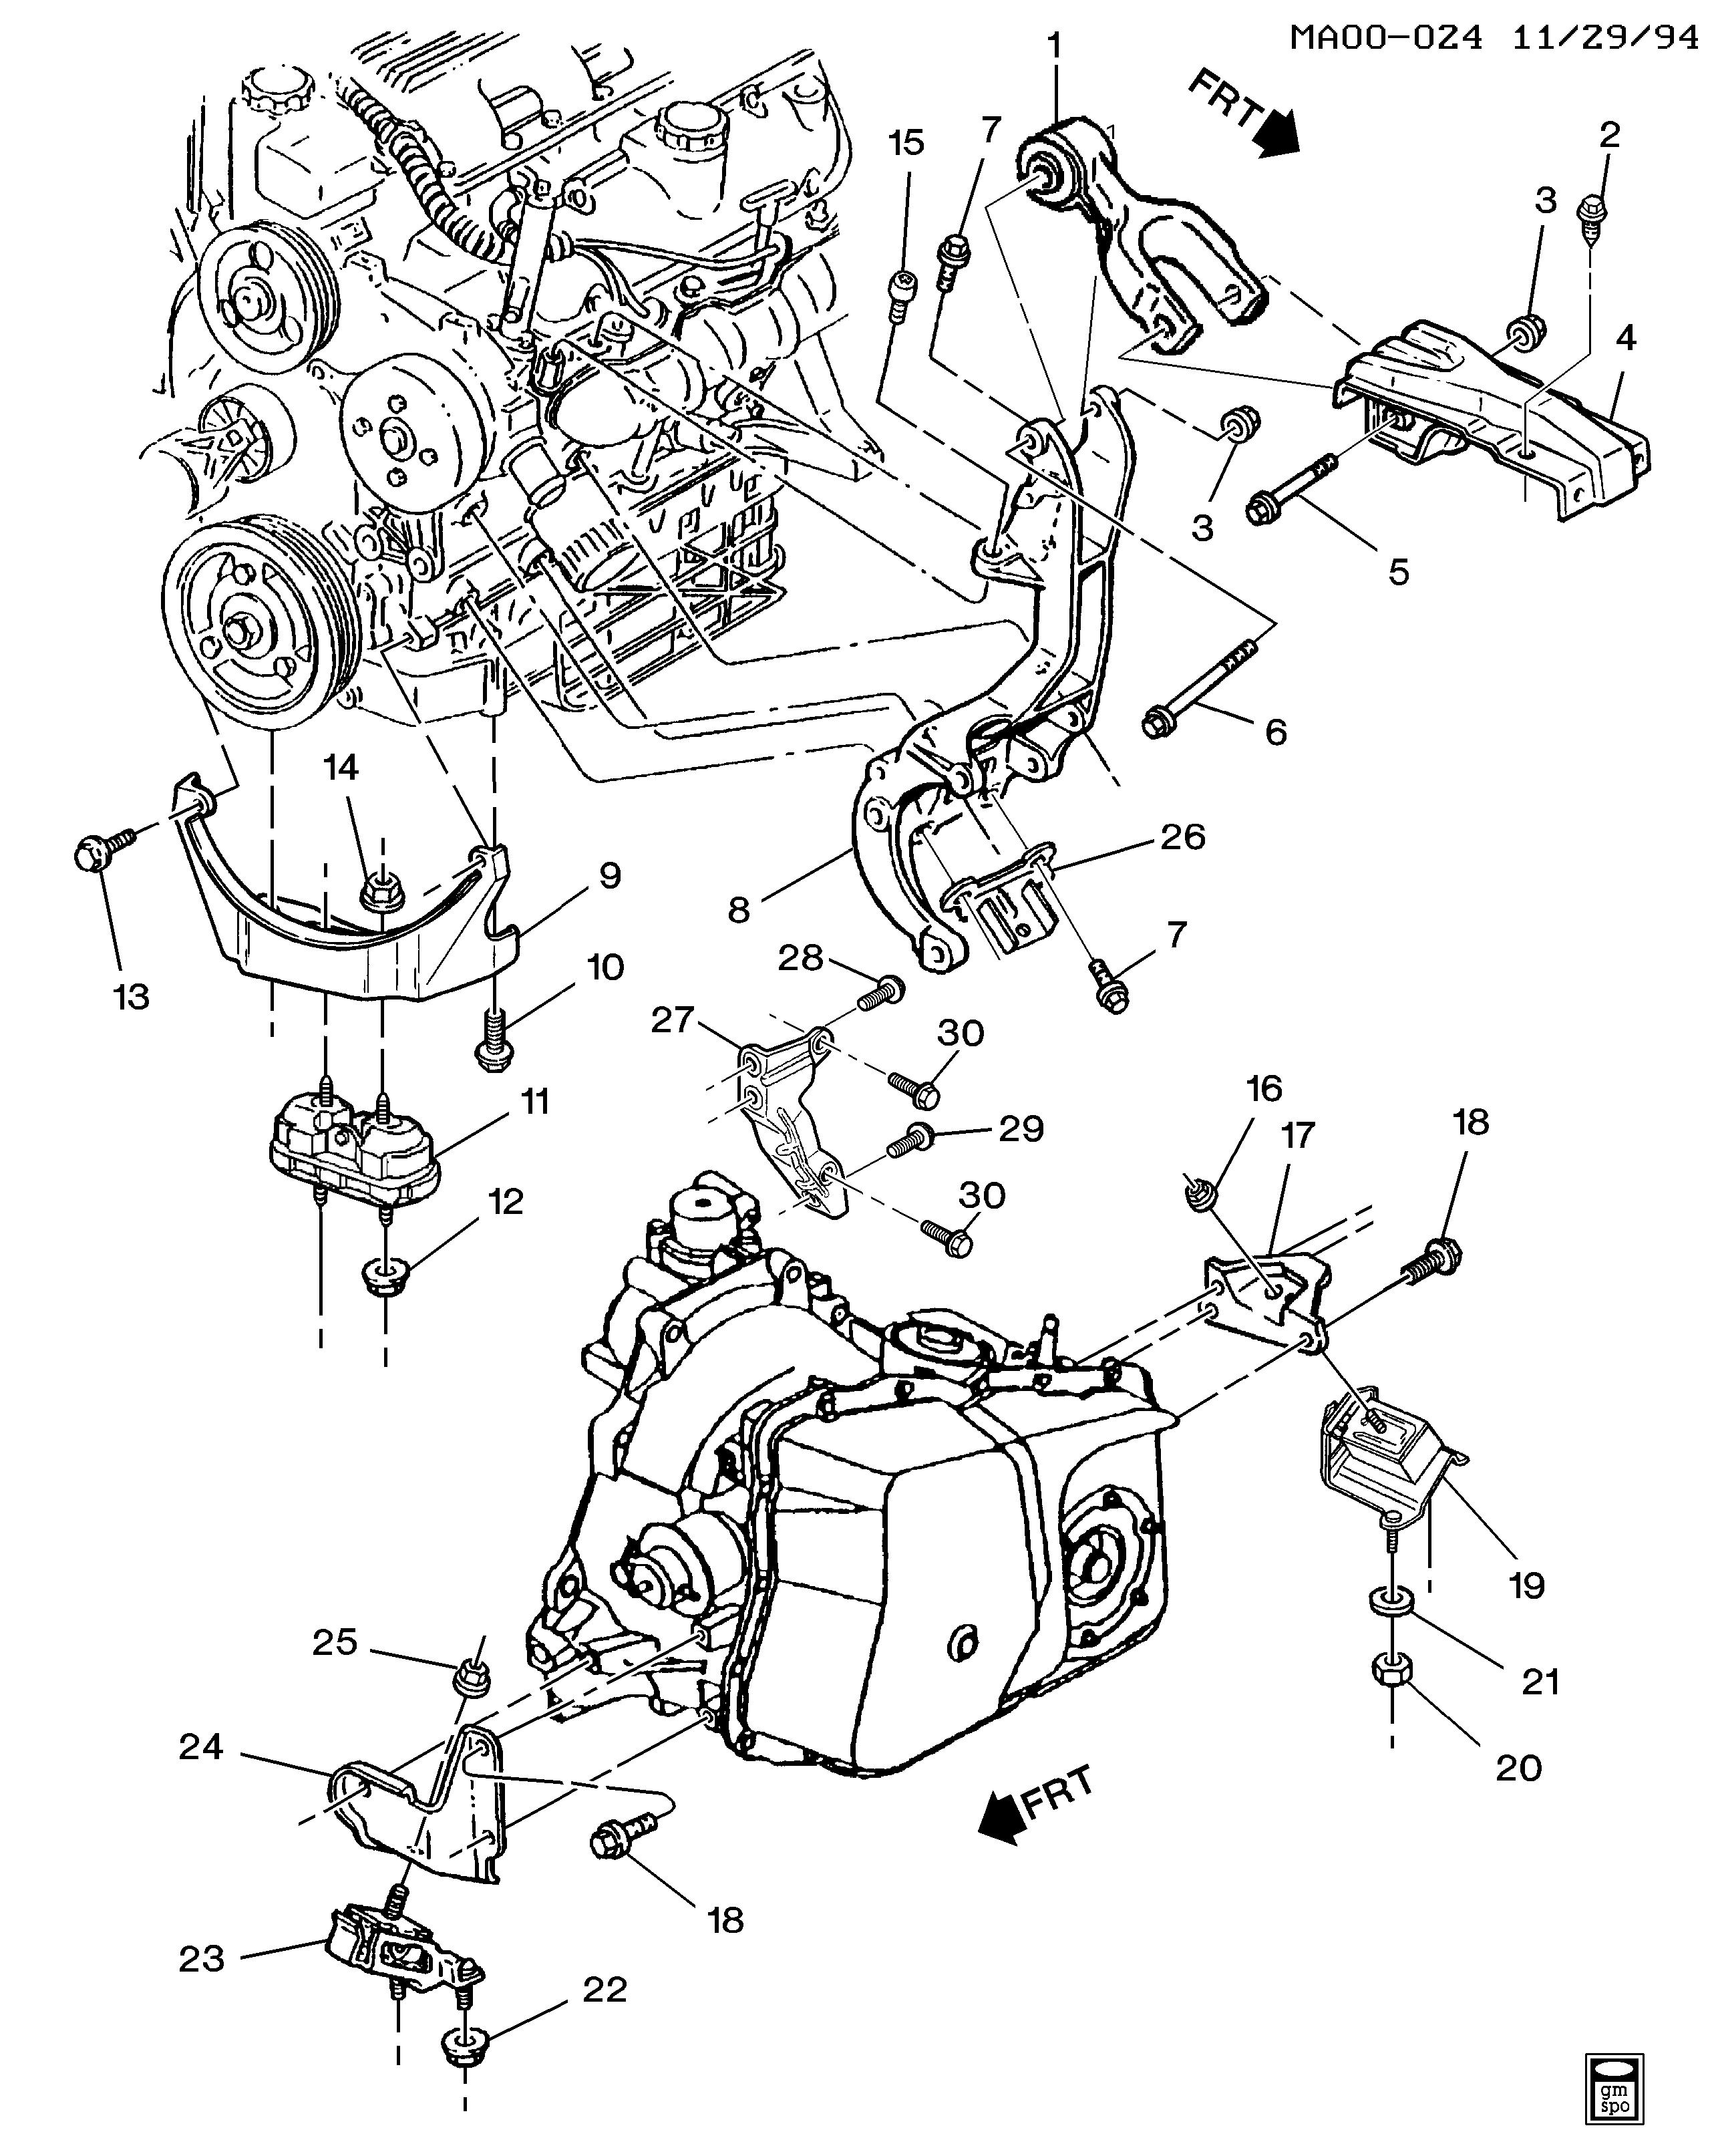 [DIAGRAM_38IU]  Buick Century - A ENGINE & TRANSMISSION MOUNTING-V6 (L82/3.1M) > EPC Online  > Nemiga.com | Buick Century Engine Diagram 5 7 |  | nemigaparts.com